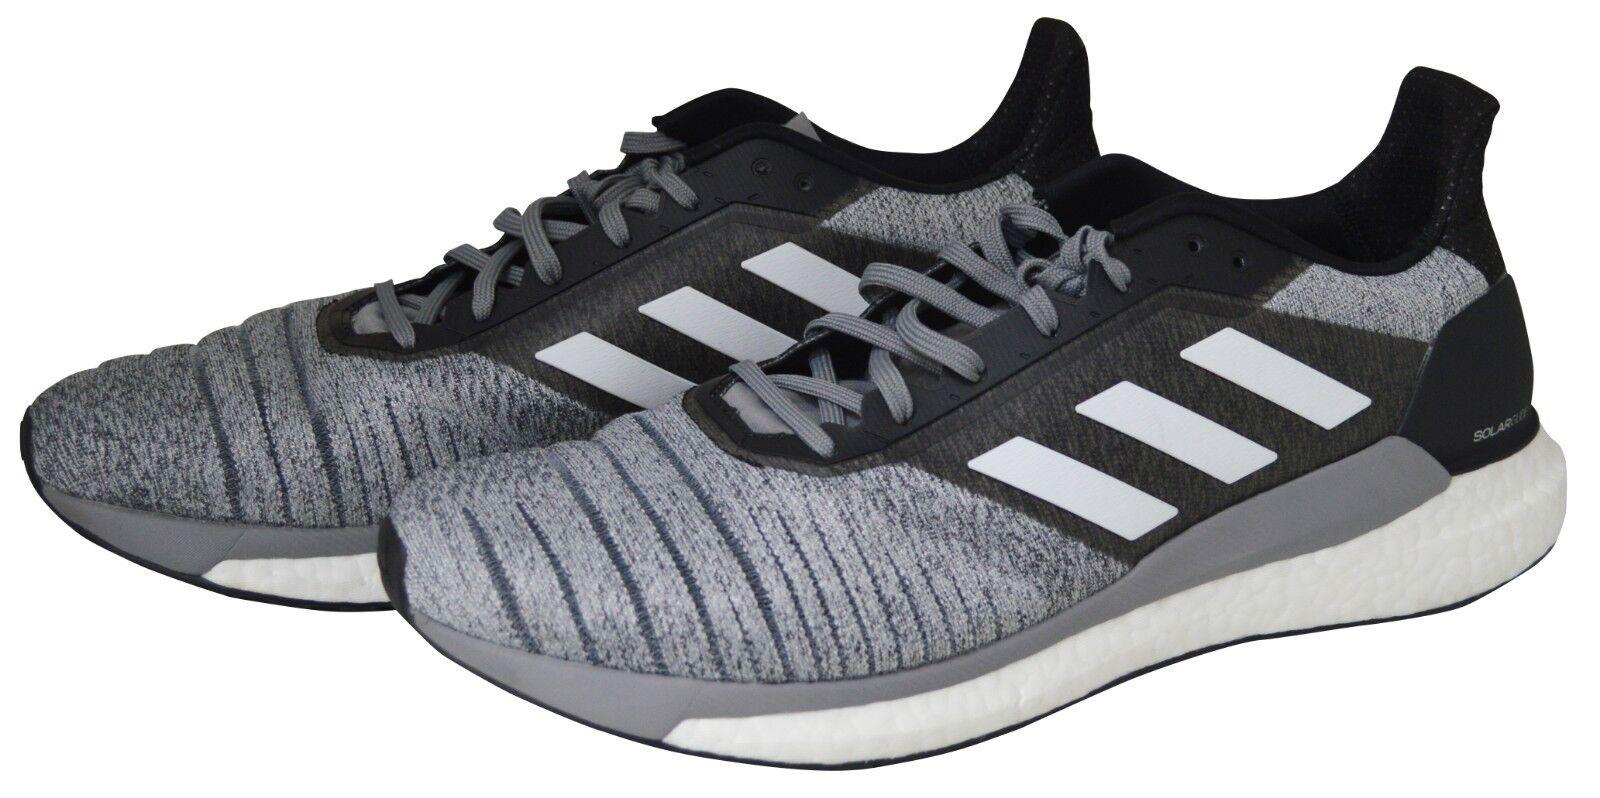 Adidas Black / Grey Solar (12.5 Glides Trainers / Sneakers (12.5 Solar UK/ 46 EU MENS SIZE) 0f9cb3